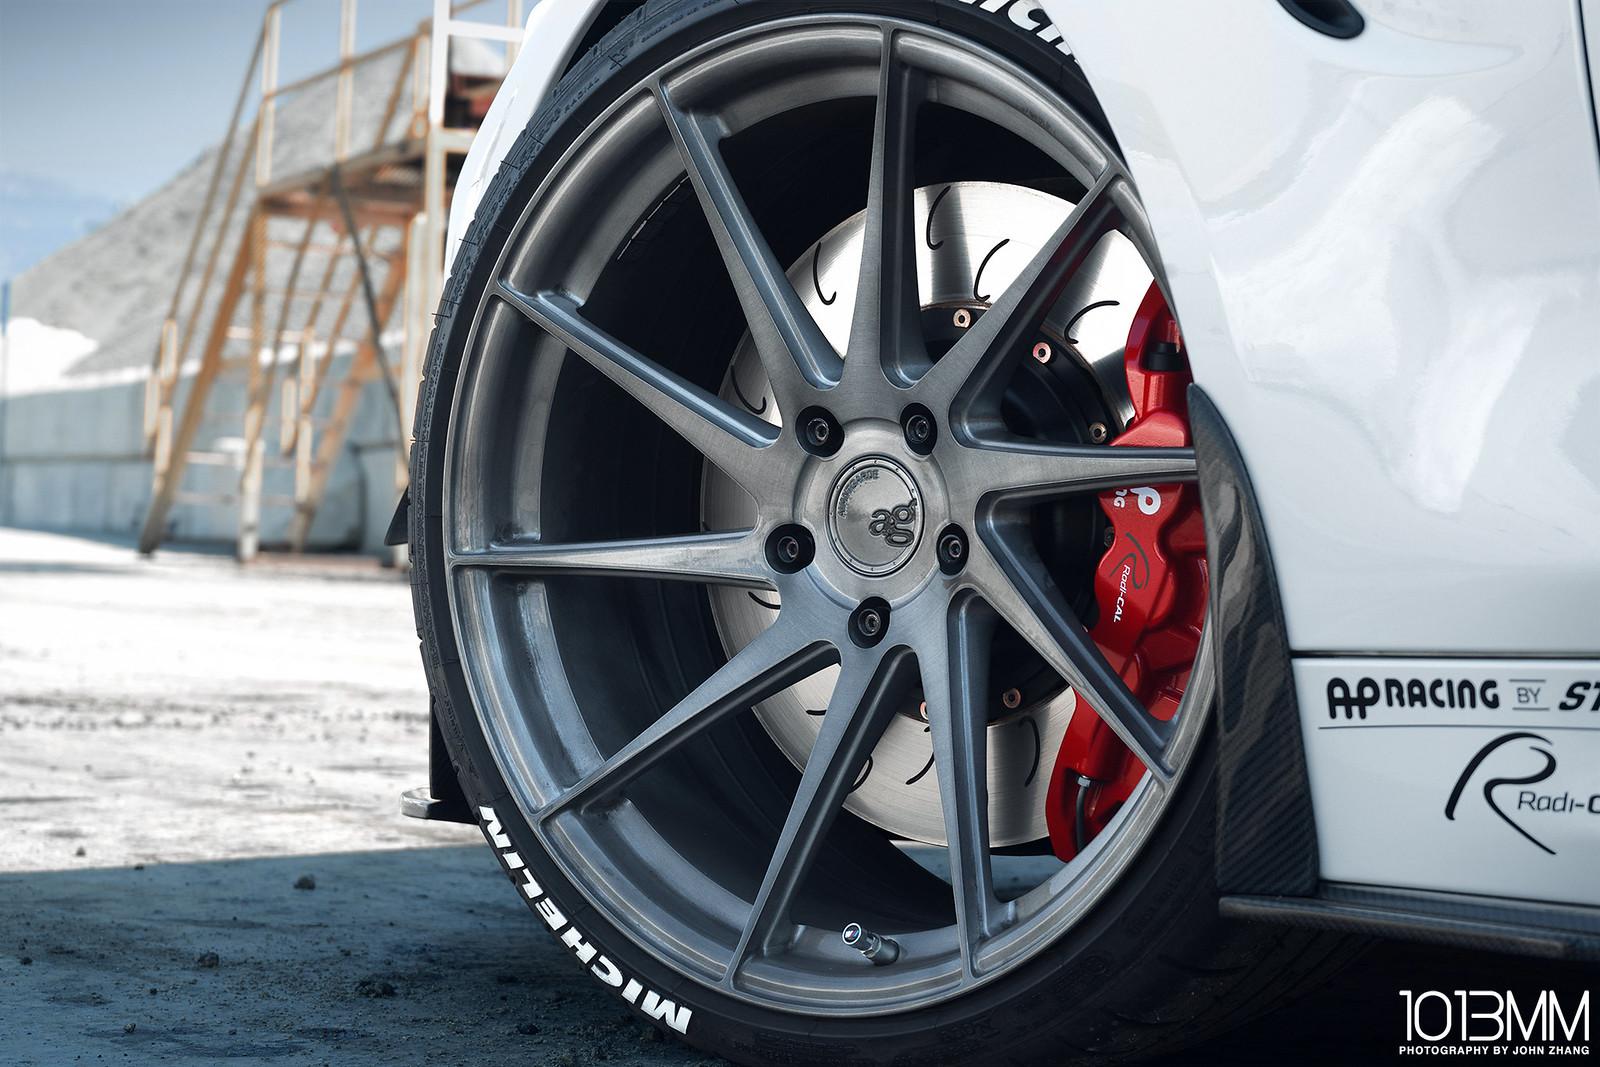 AW M4 / RevoZport / Avant Garde M621 Wheels / AP Racing